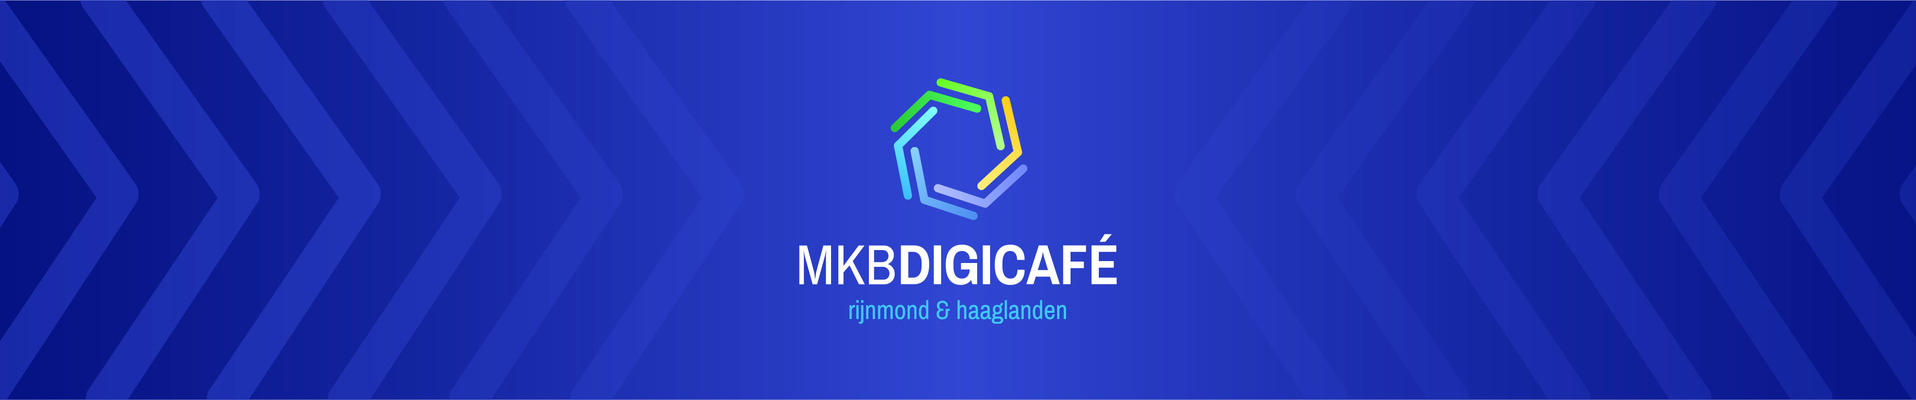 MKB Digicafé: Veilig Online Ondernemen